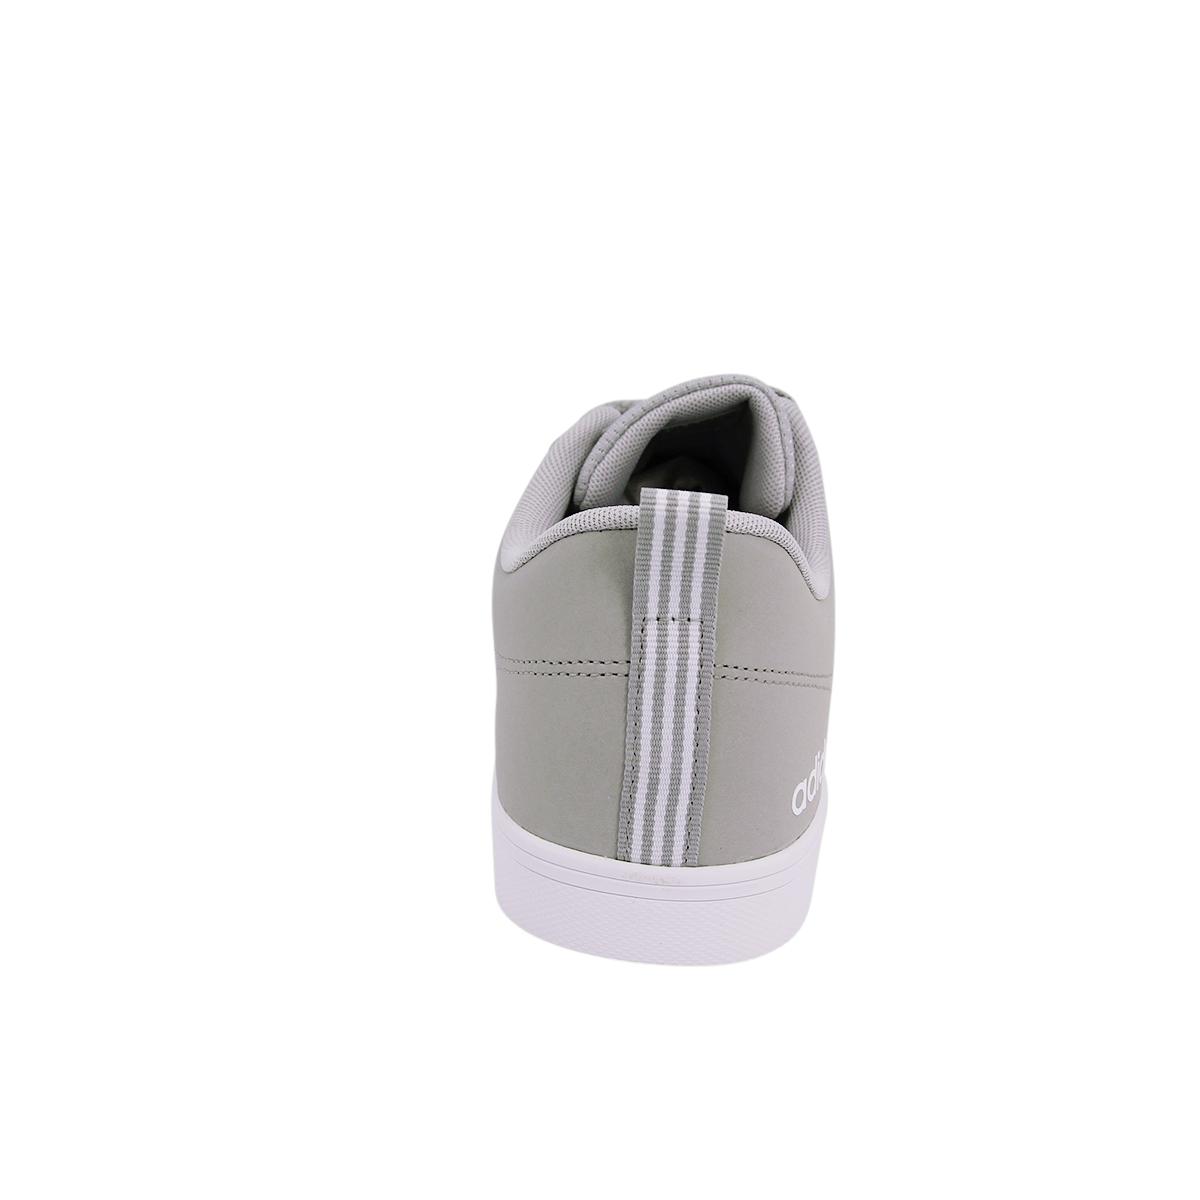 Vs Herren Sneakers Pace Neu Adidas Schuhe qd4EdS